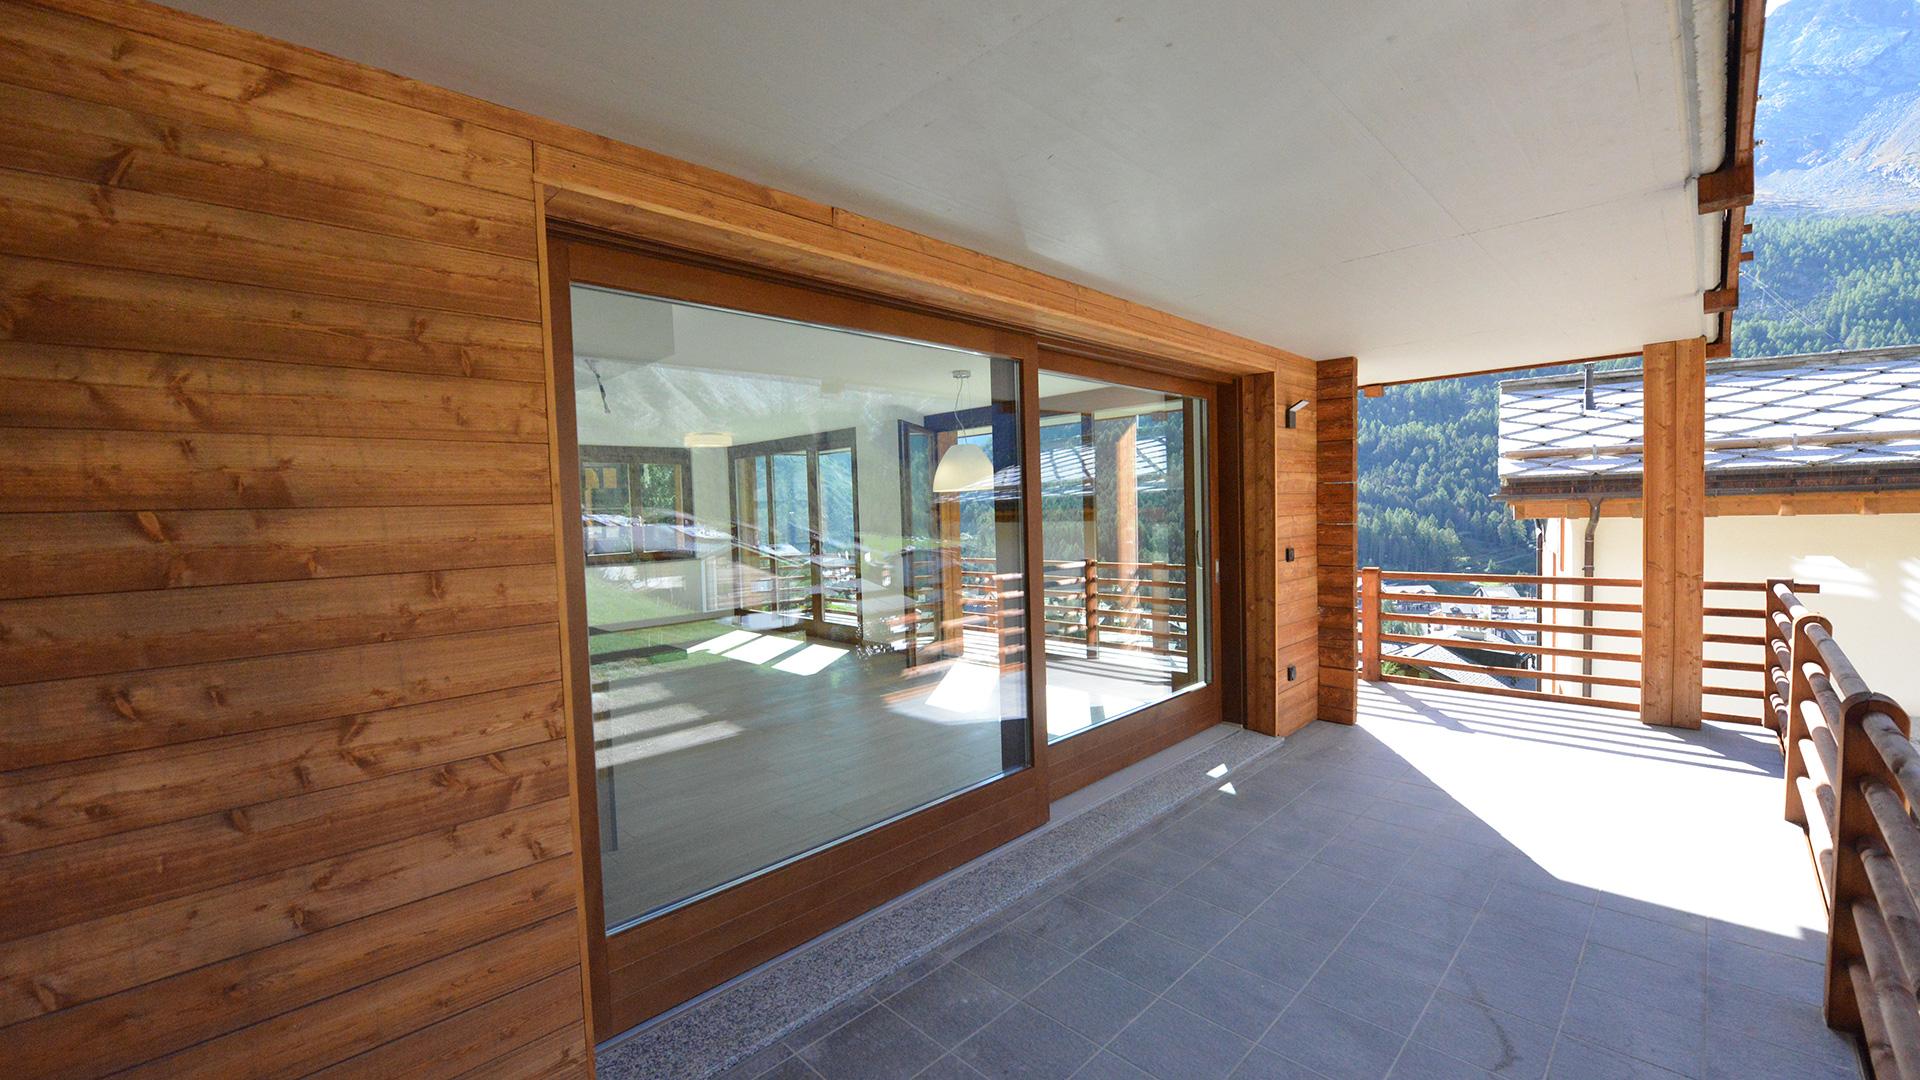 Pinacle Apts Apartments, Switzerland